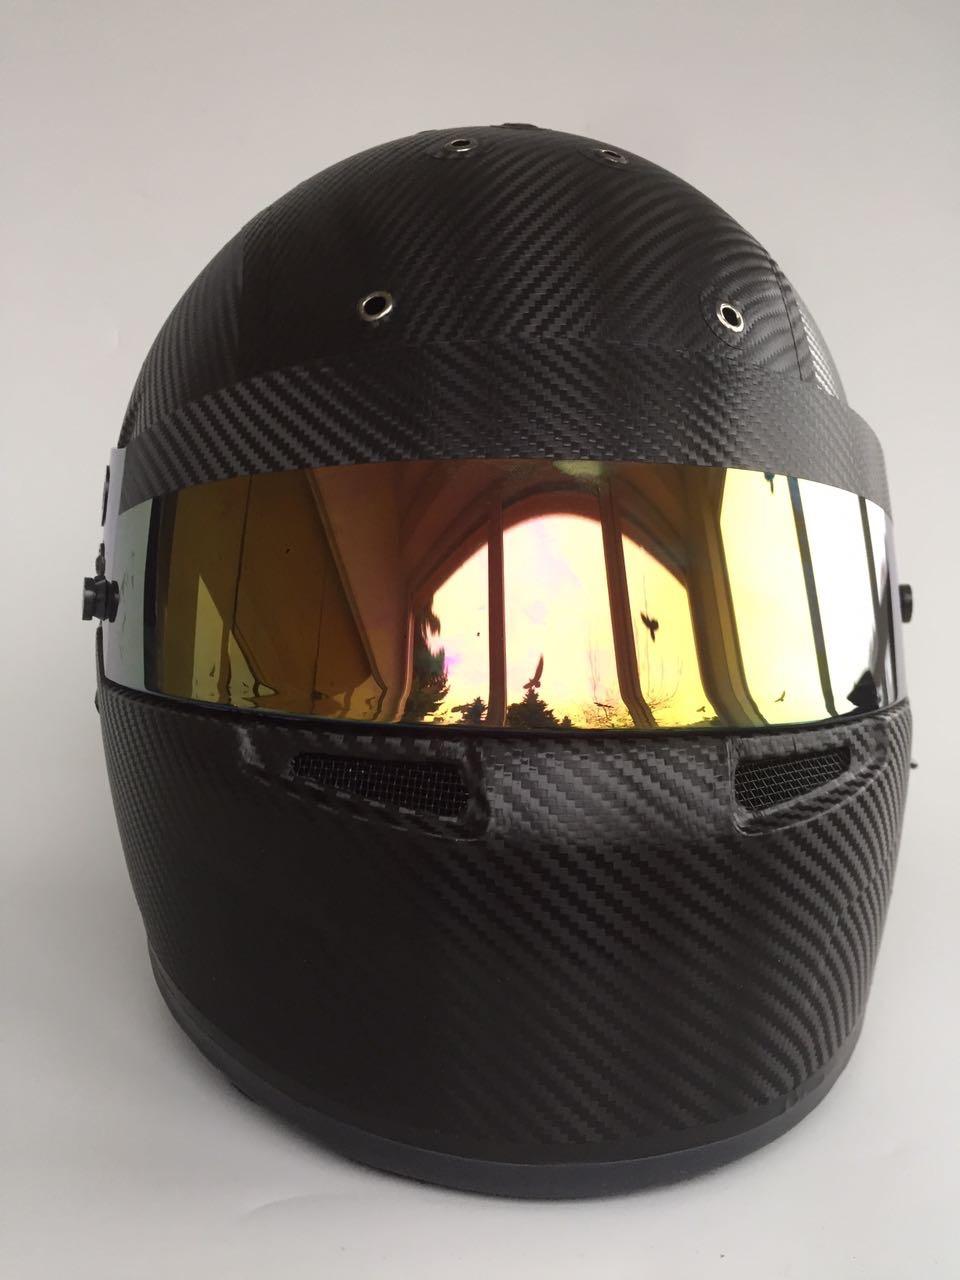 Folierung Helm Carbon 3D Folie